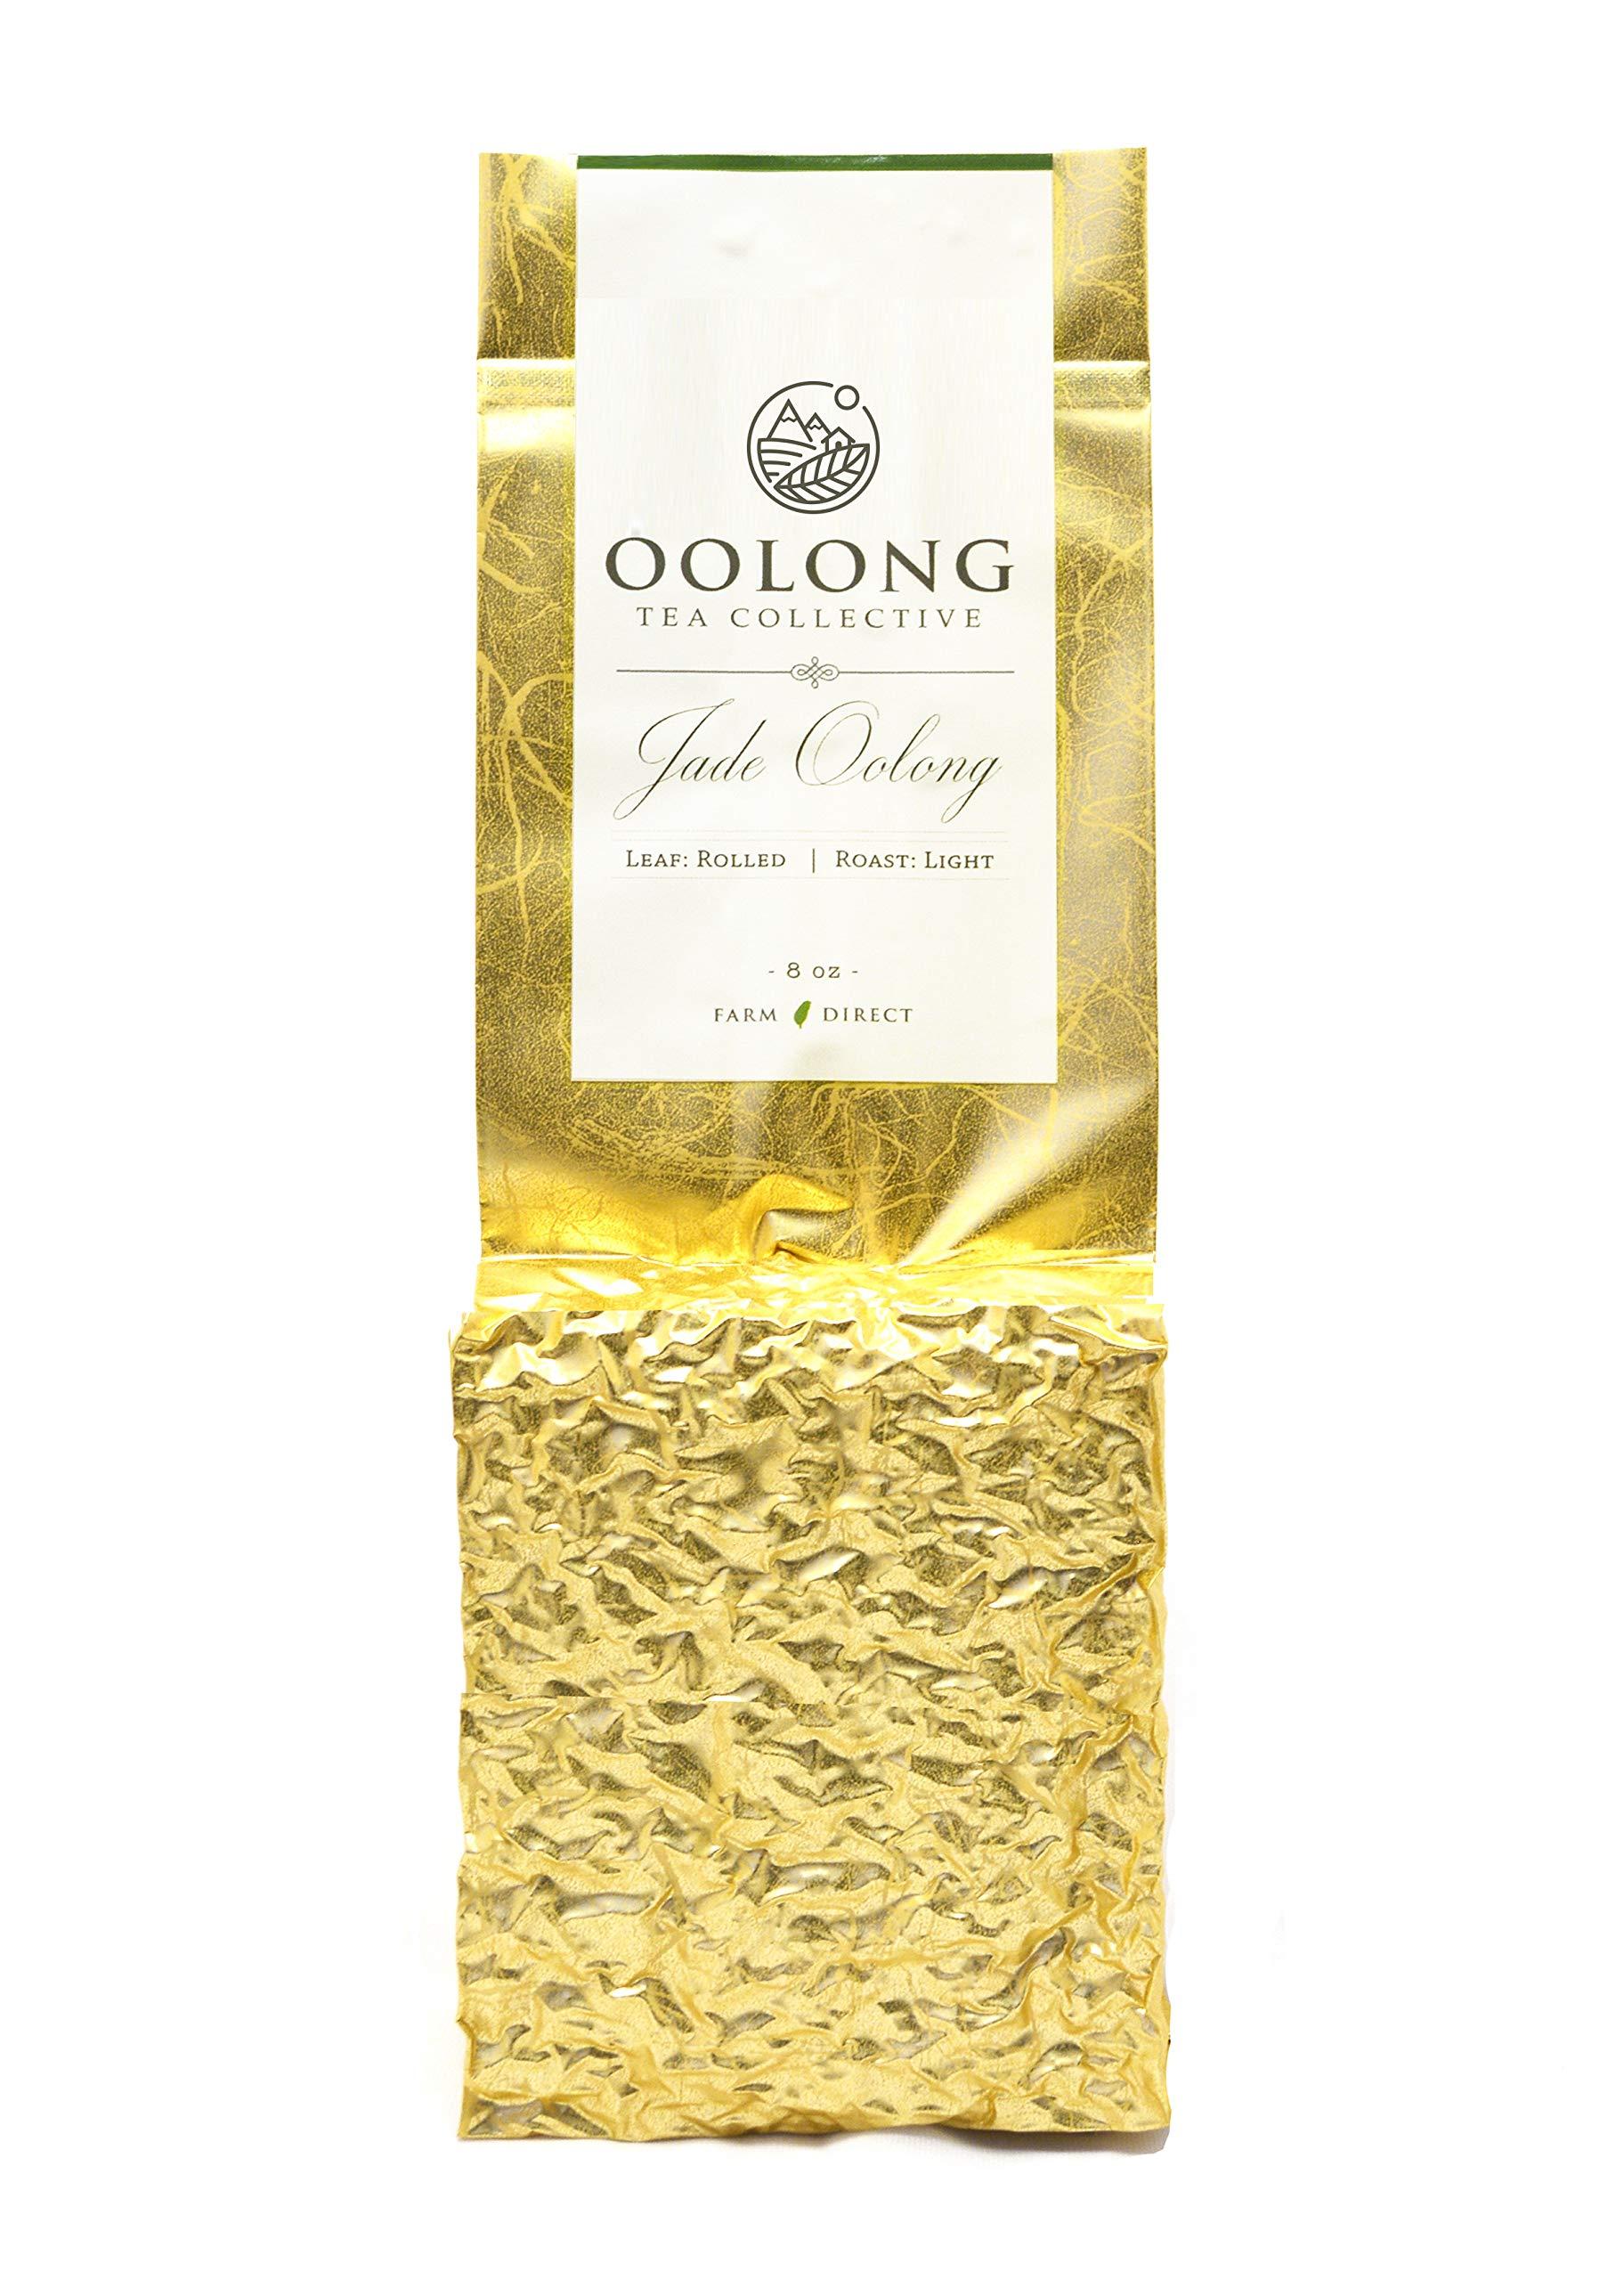 Jade Oolong Tea - 2019 Fresh Harvest - Natural Loose Leaf Tea - No Additives - 100% Taiwan Farm Direct by Oolong Tea Collective (8oz)